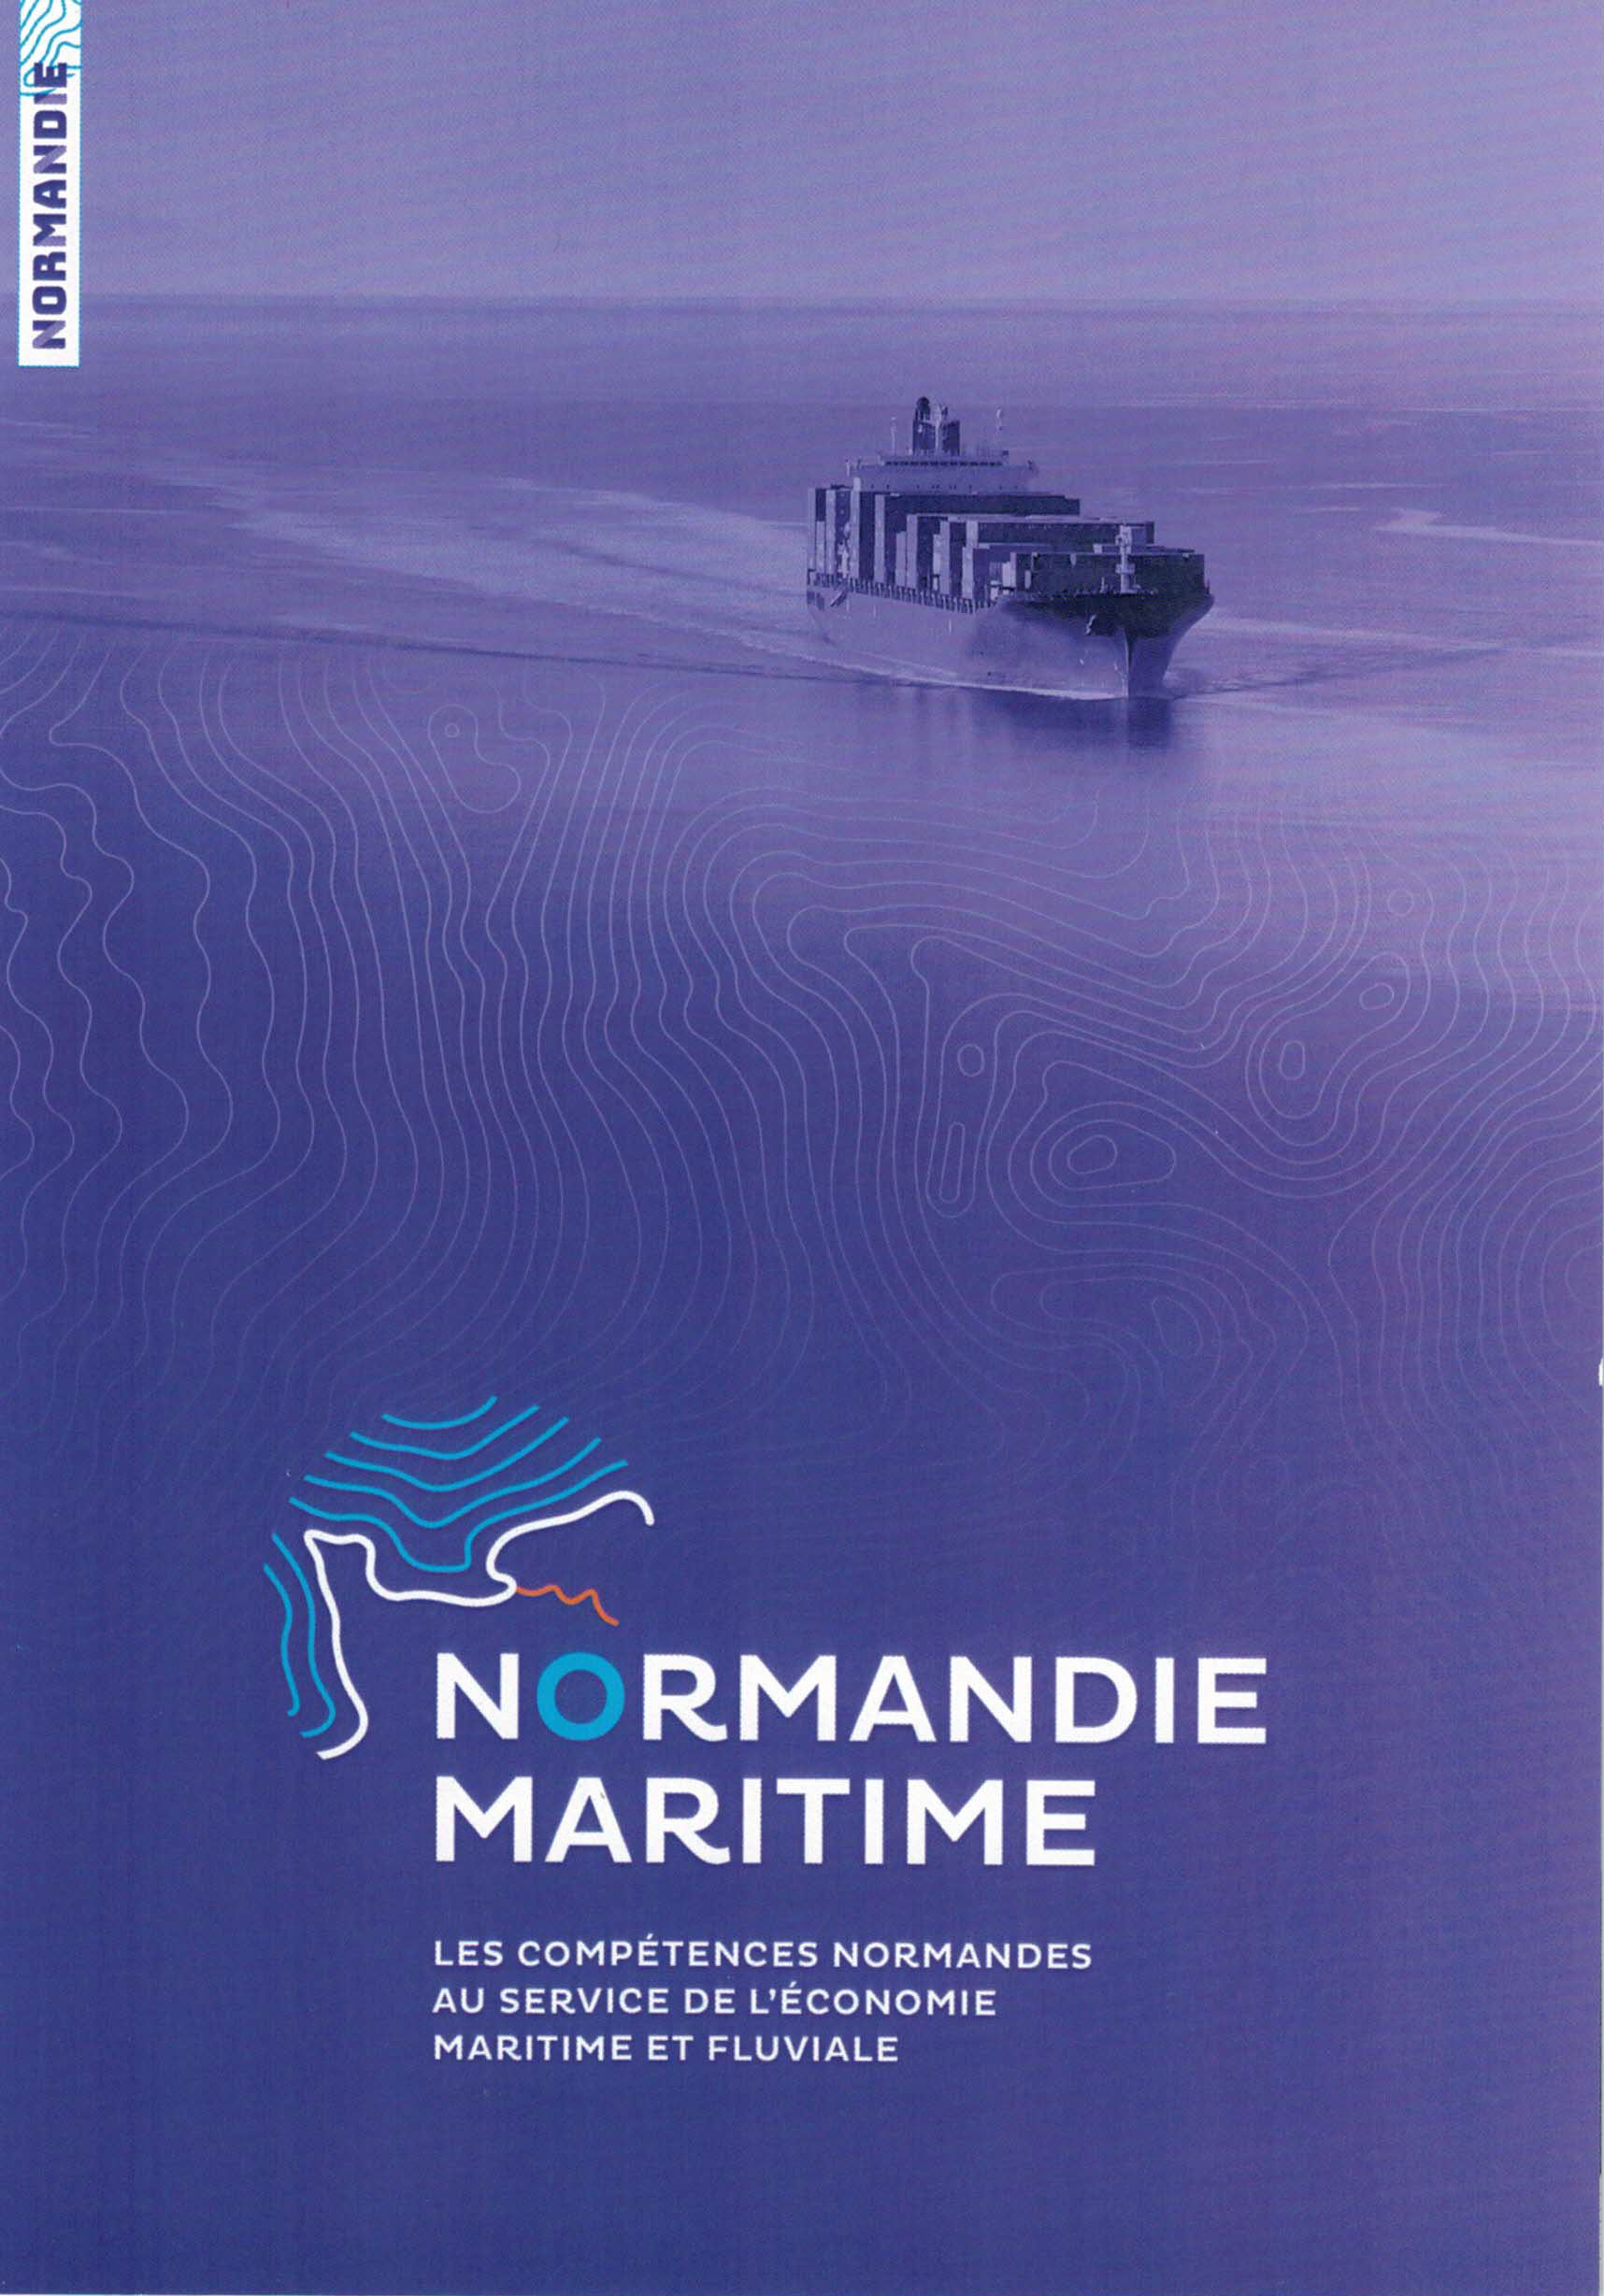 Normandie Maritime